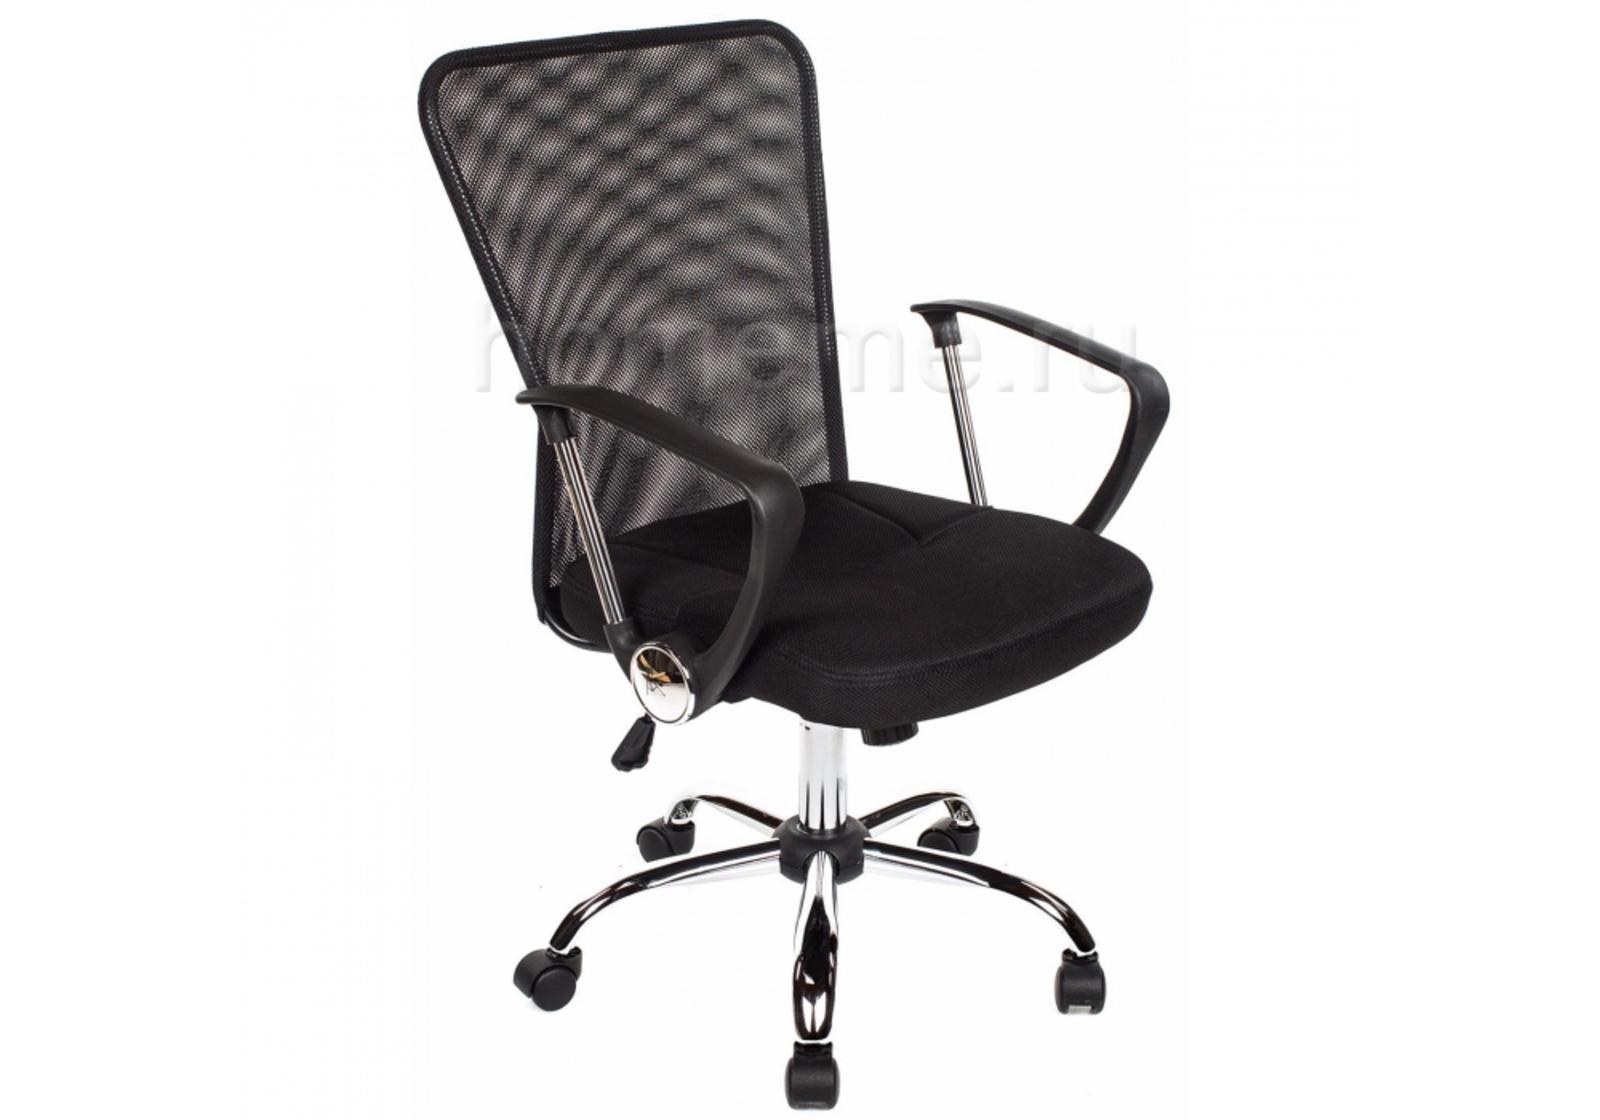 Кресло для офиса HomeMe Luxe от Homeme.ru